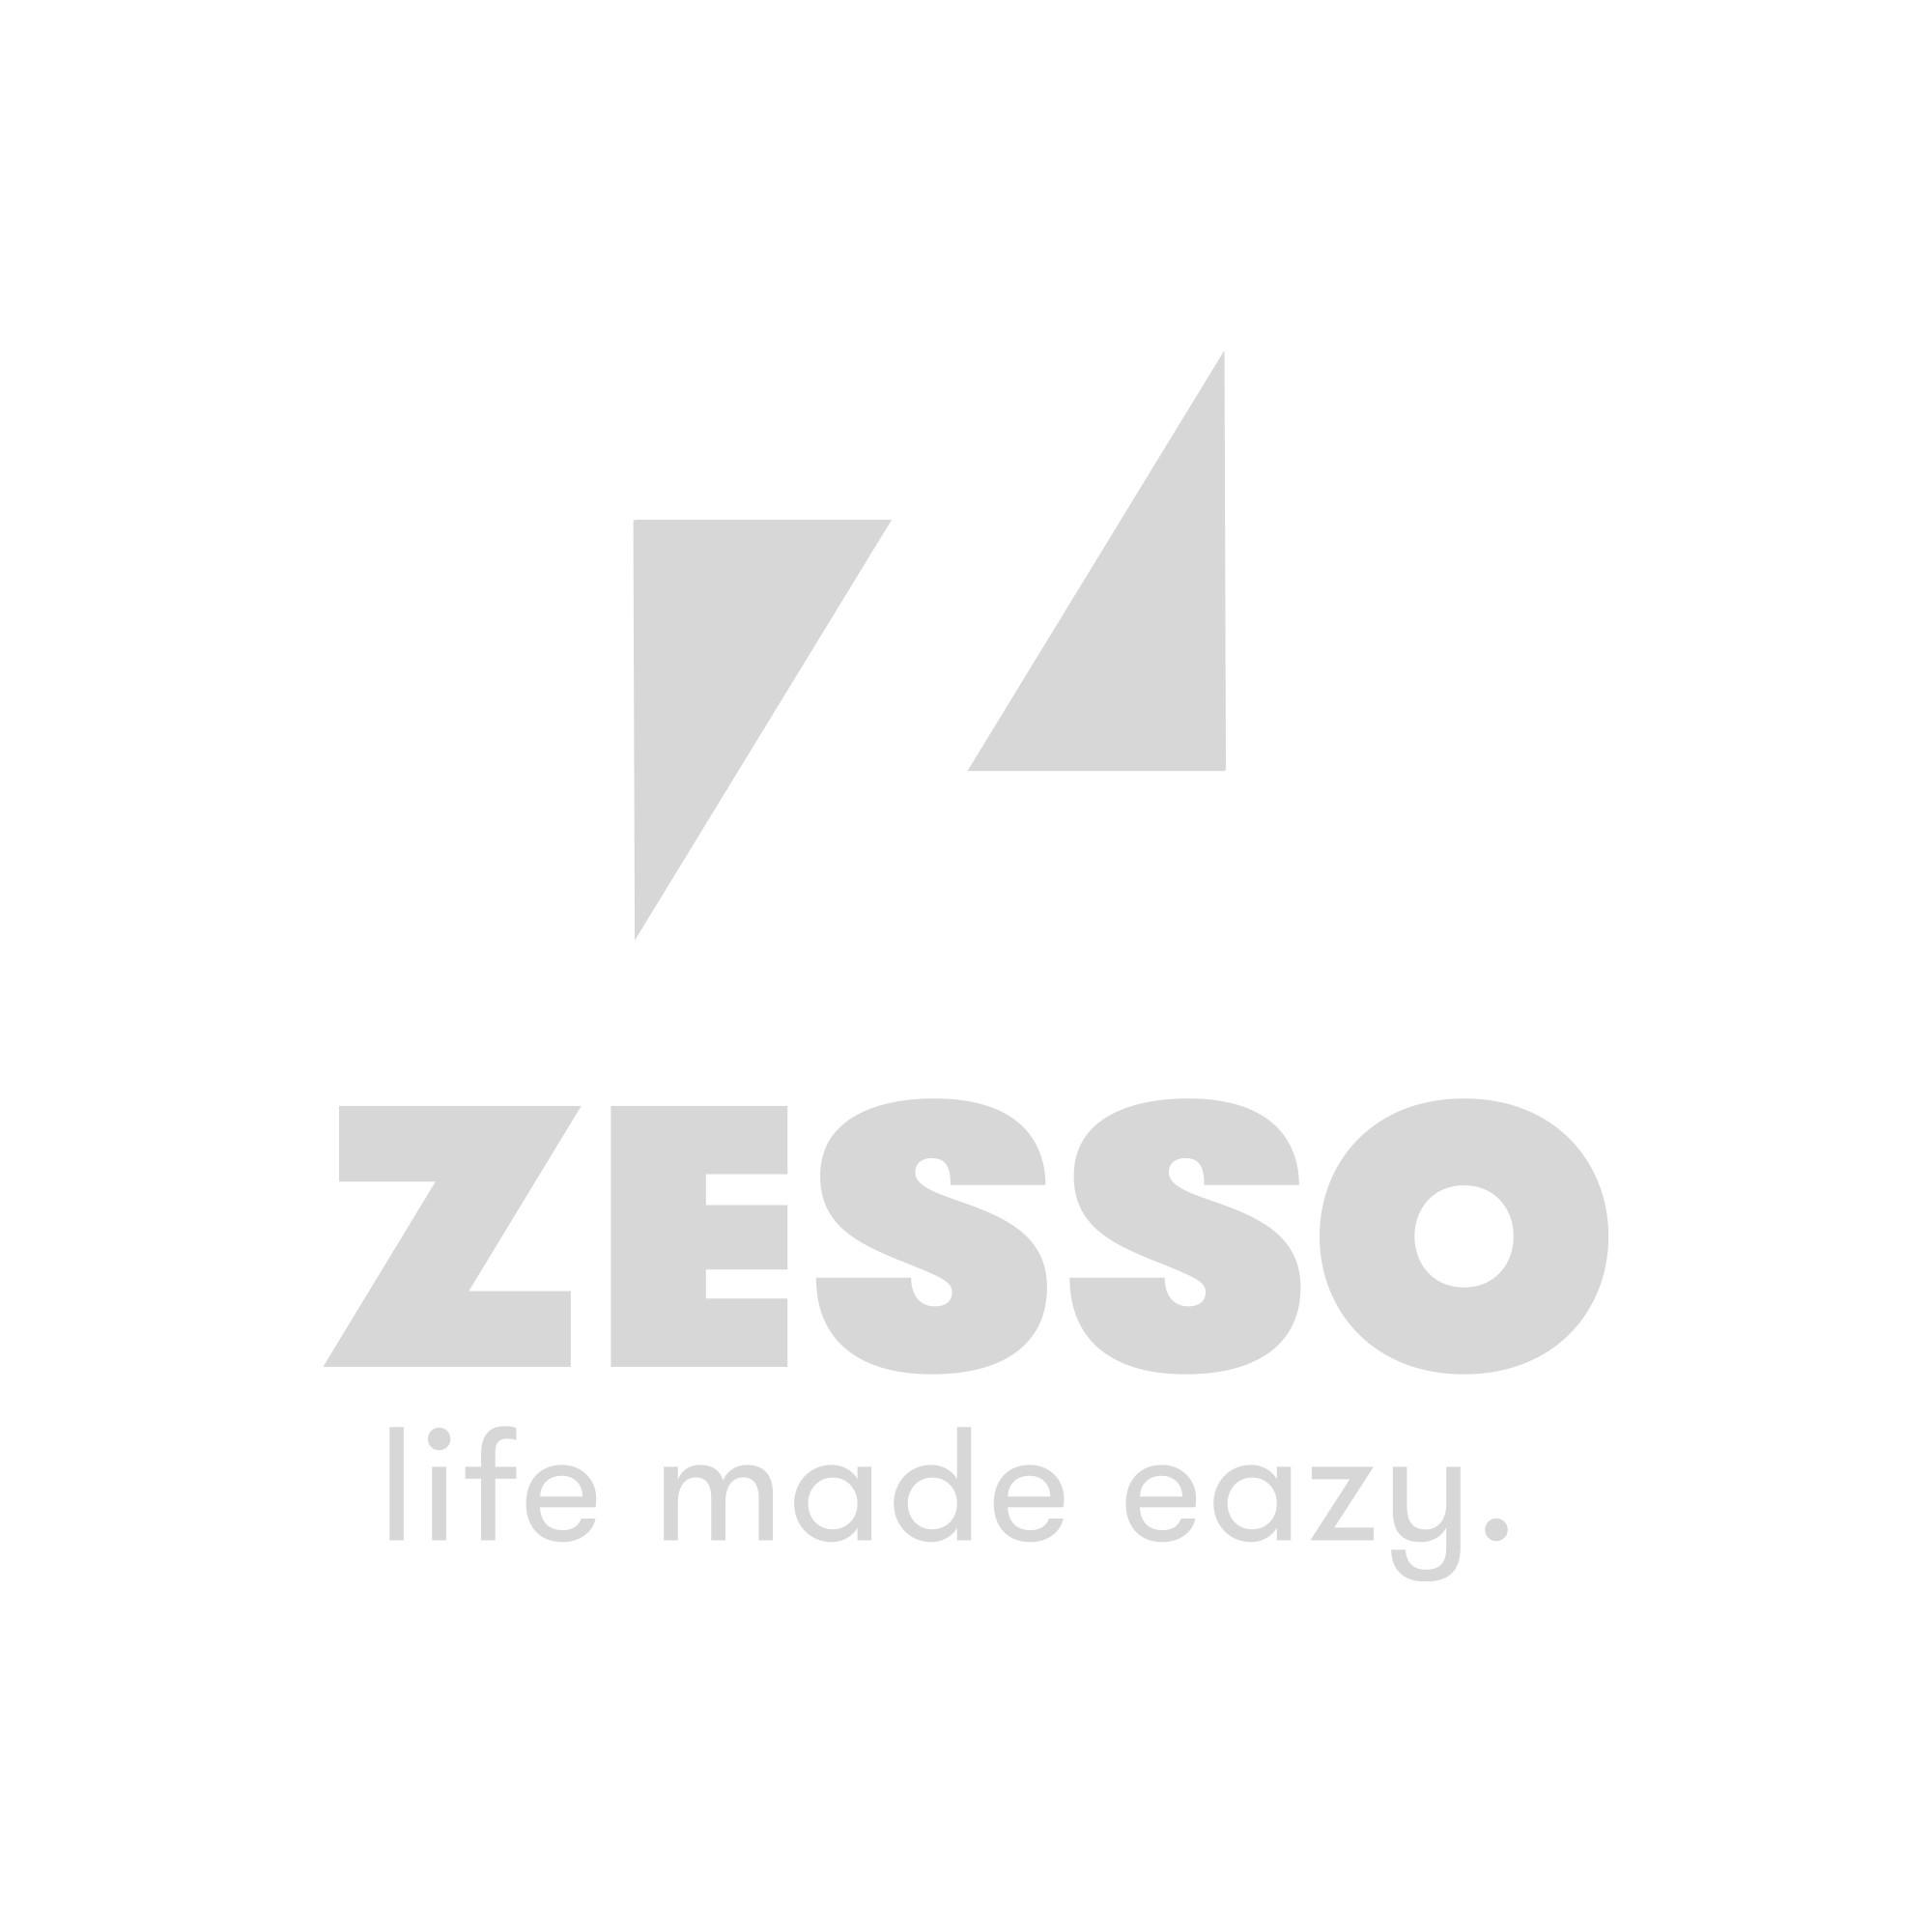 Yookidoo Badspeelgoed Spin 'n Sort Spout Pro Waterfontein